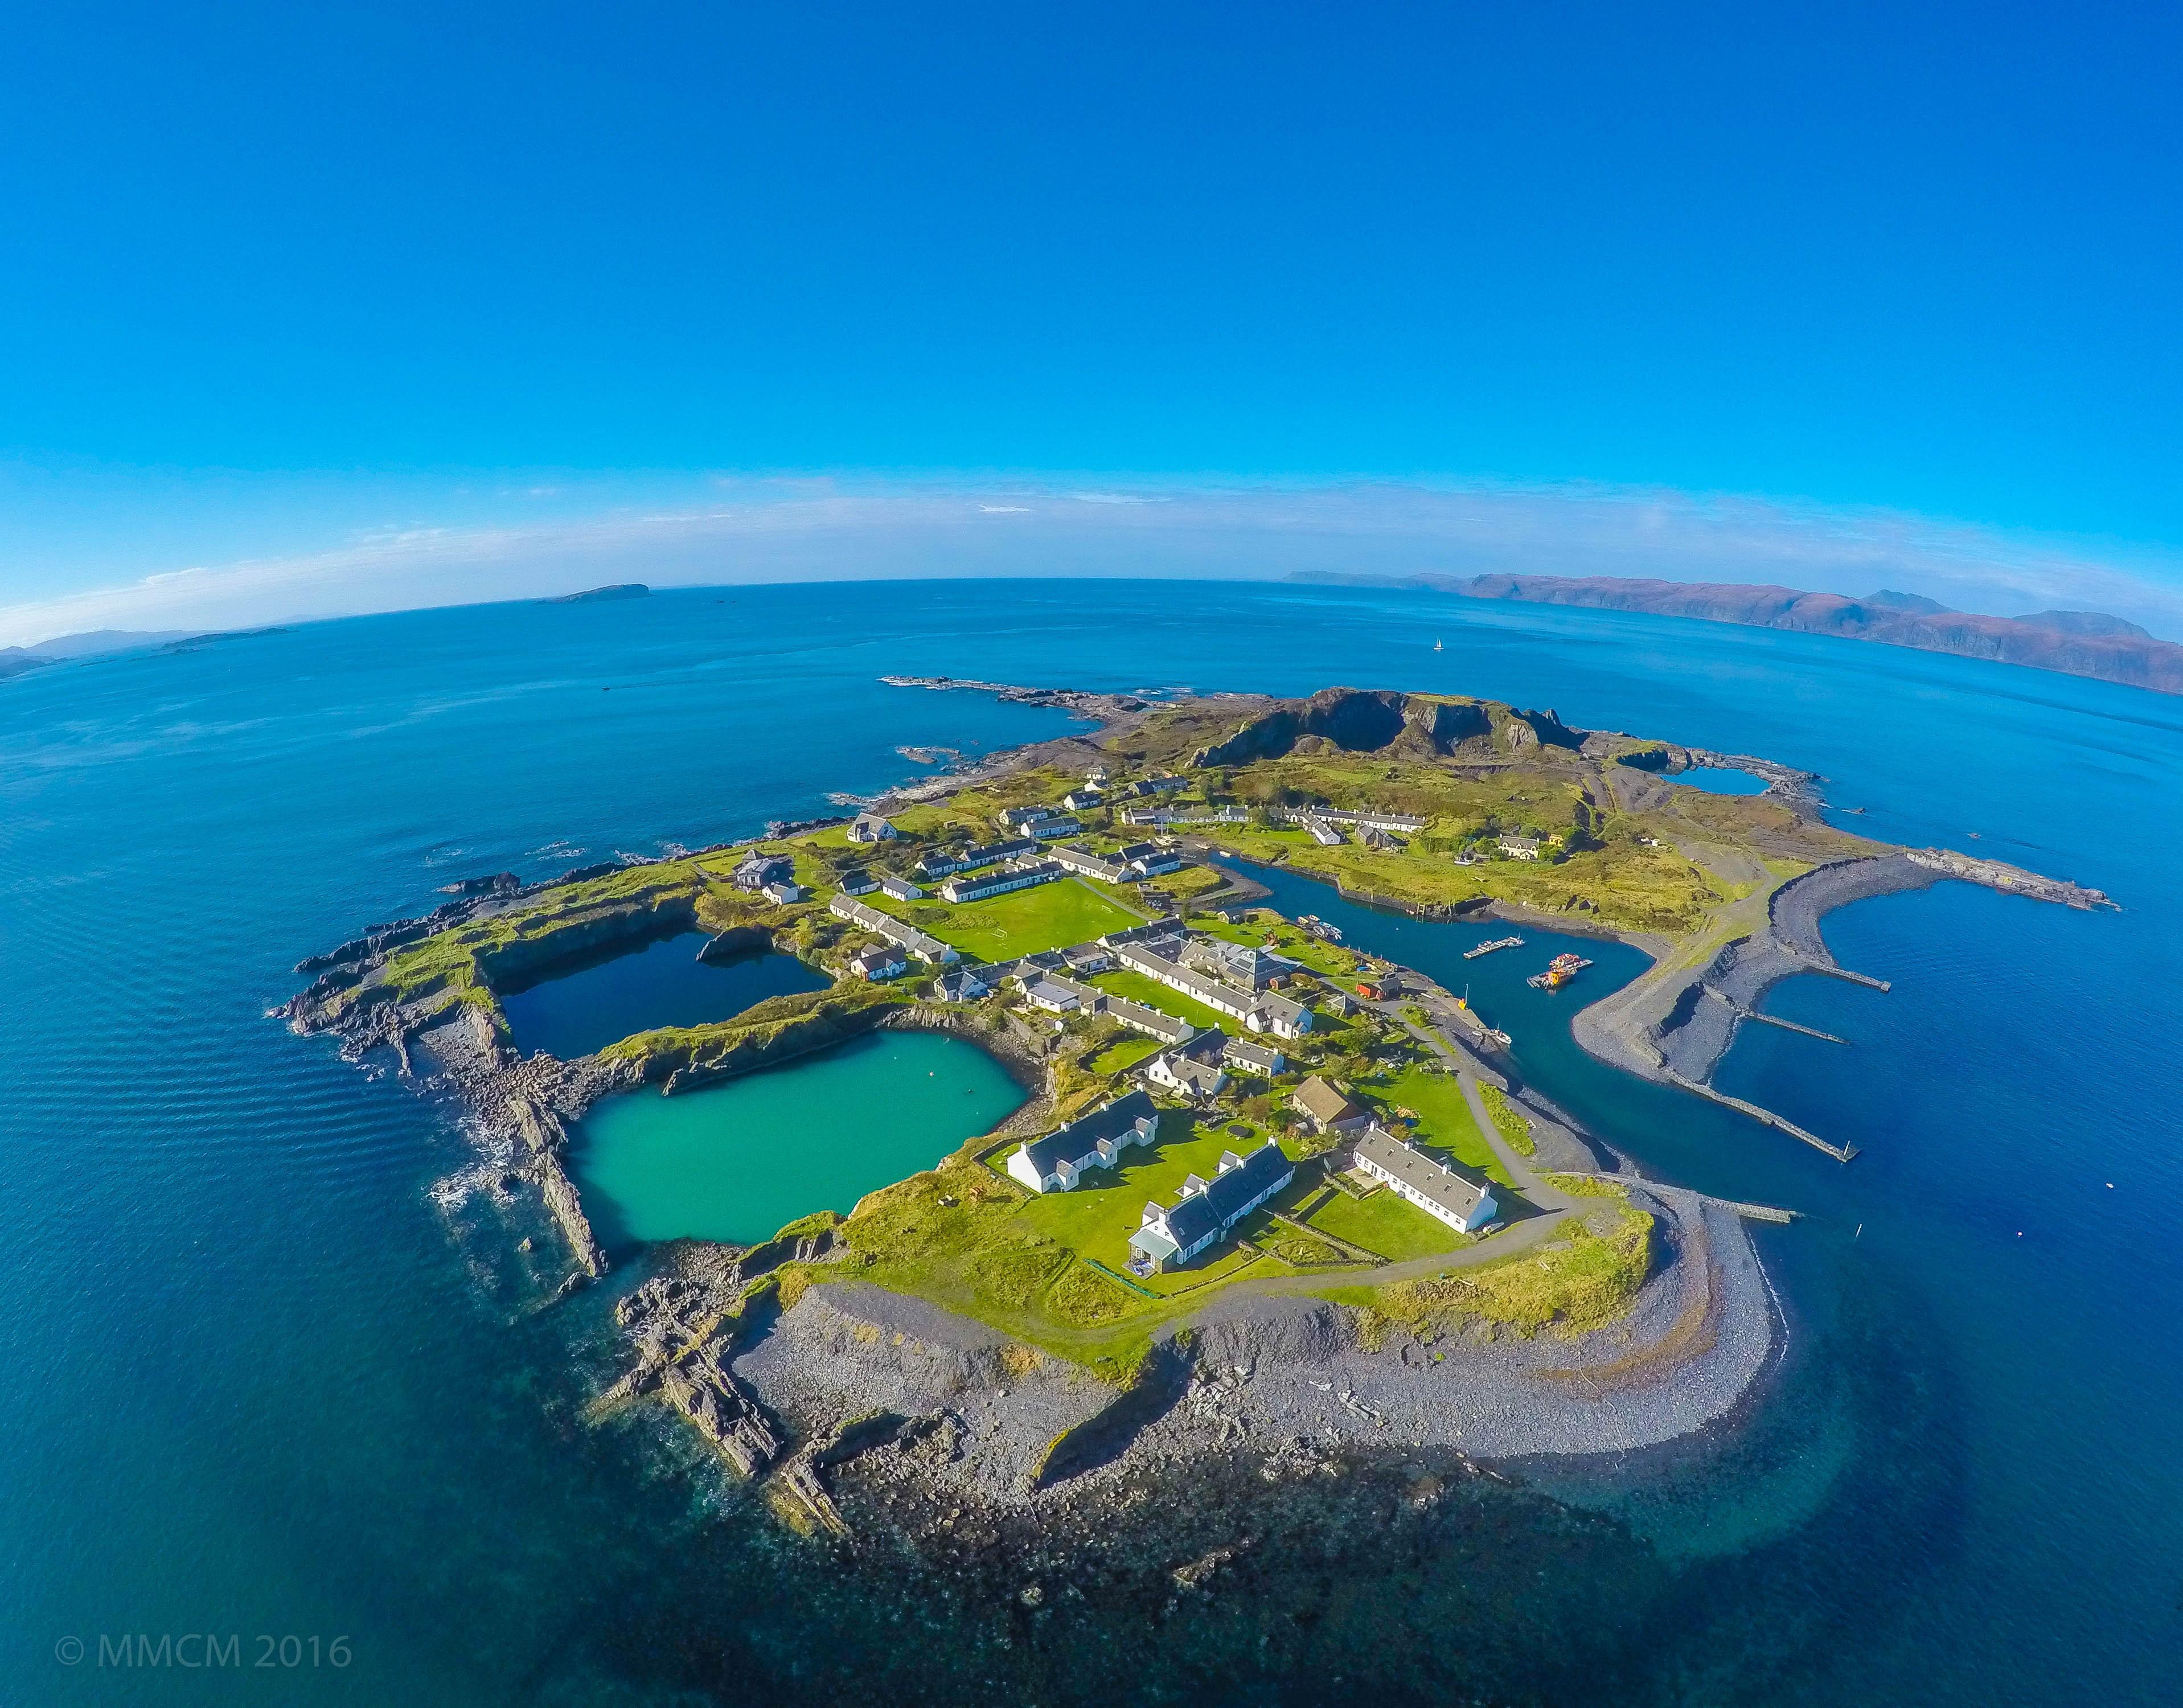 Easdale Island